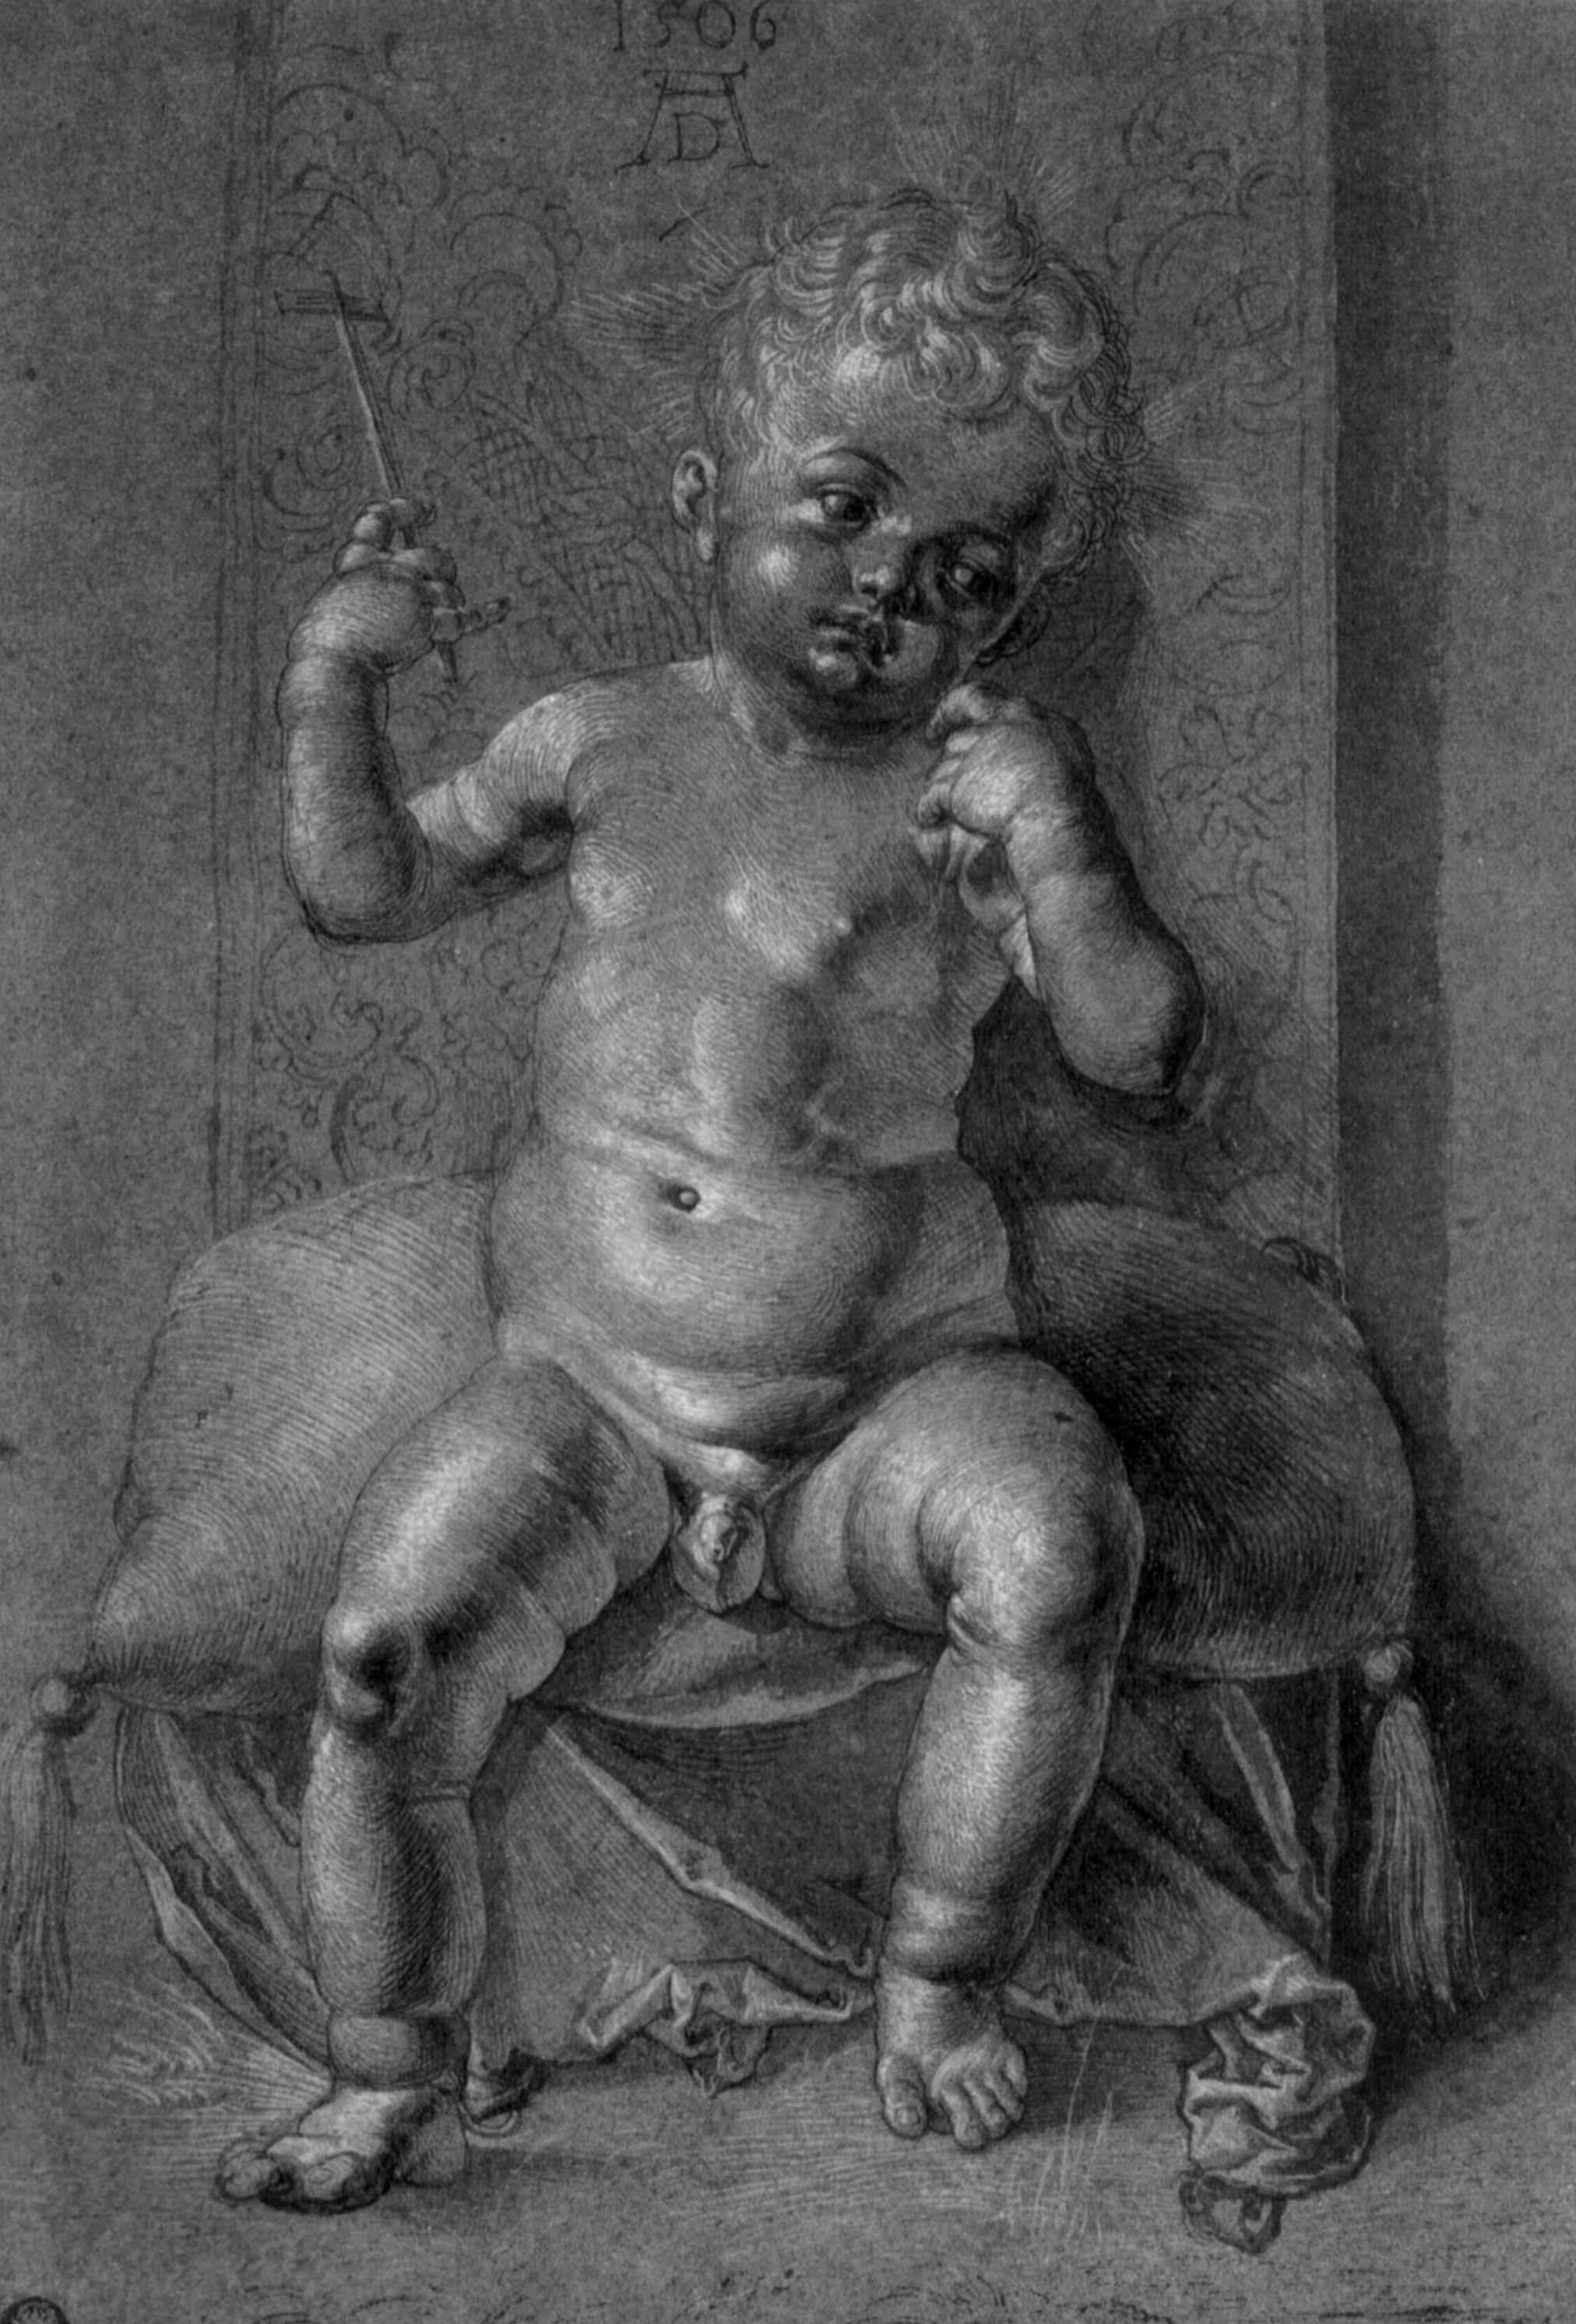 Seated Nude Child